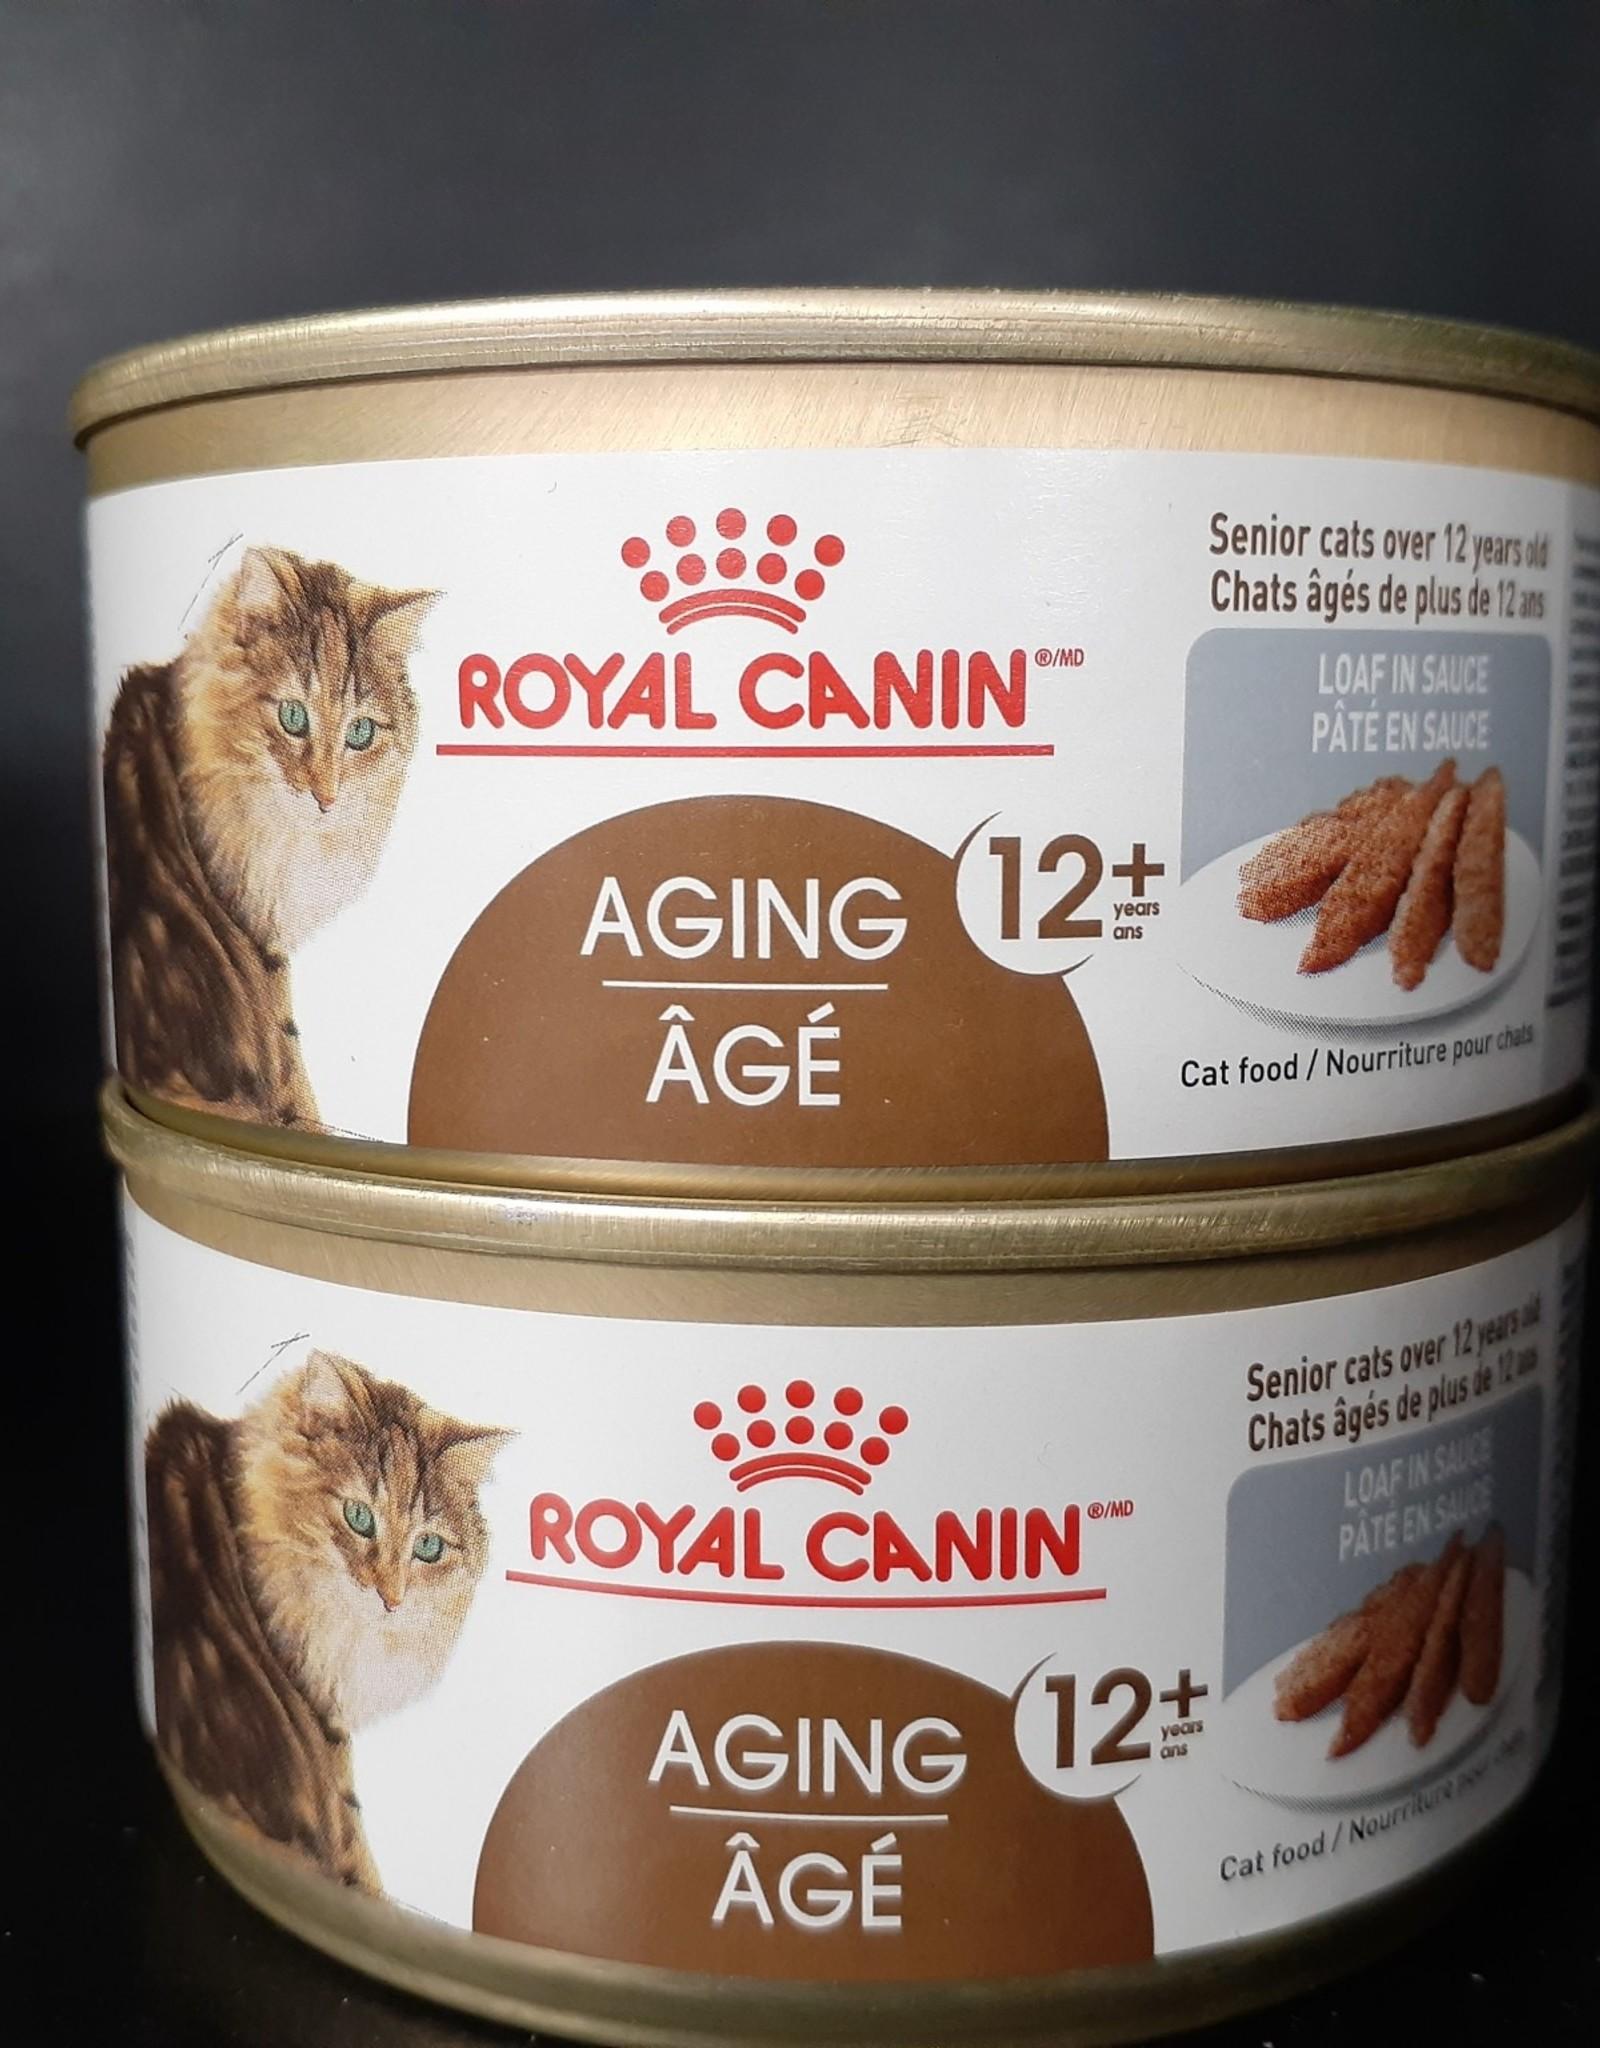 Royal Canin Royal Canin Aging 165g